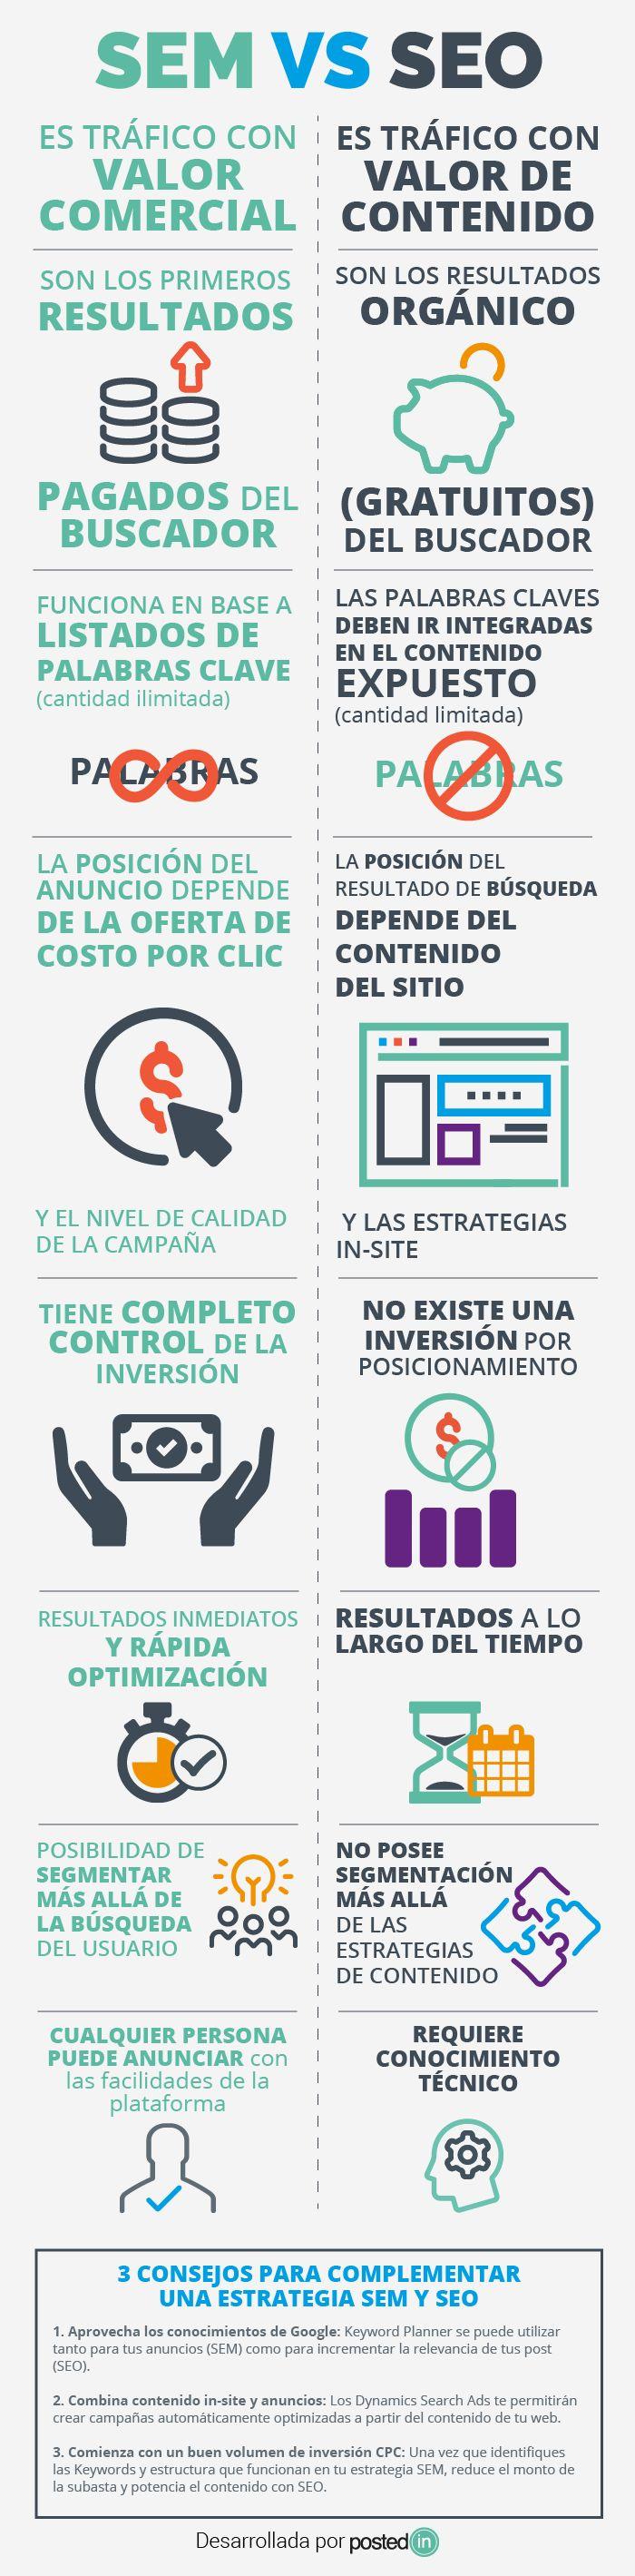 SEO vs SEM #infografia